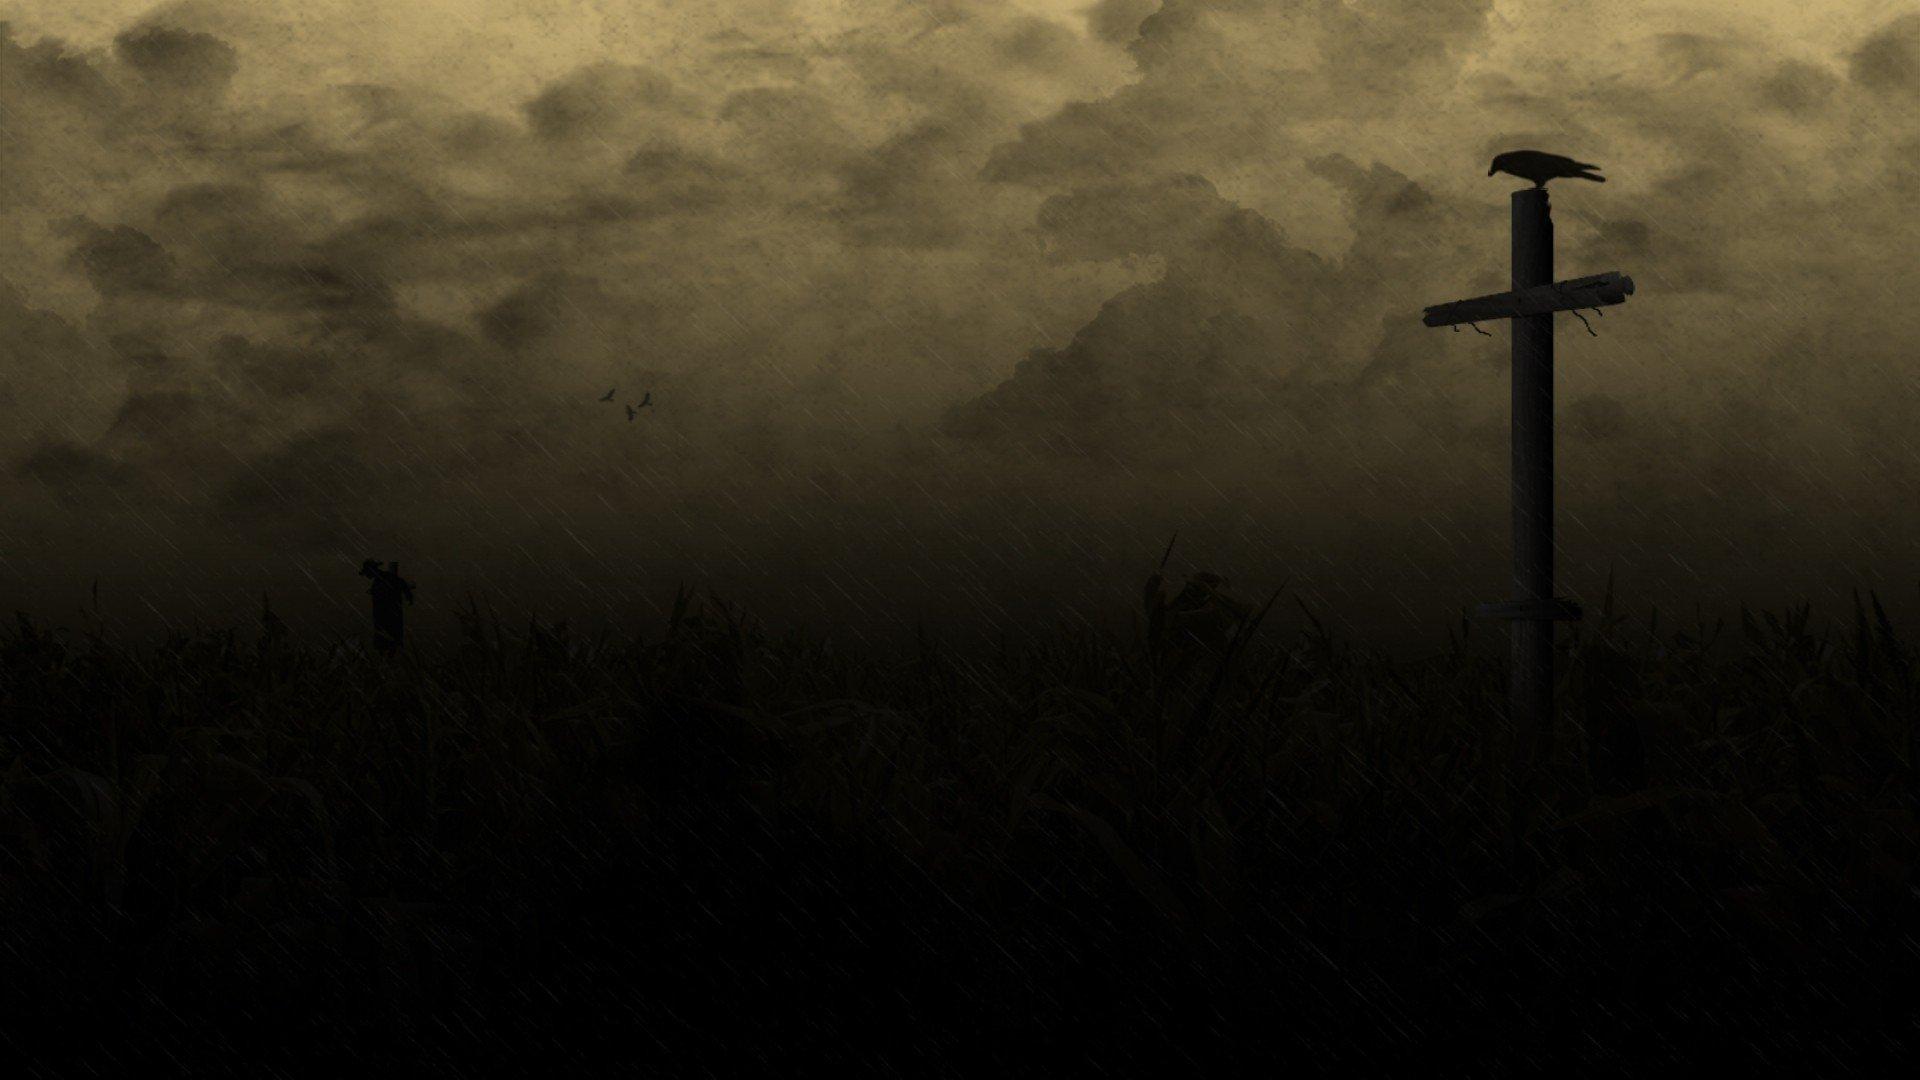 Horror creepy cross dark Raven country field wallpaper 1920x1080 1920x1080